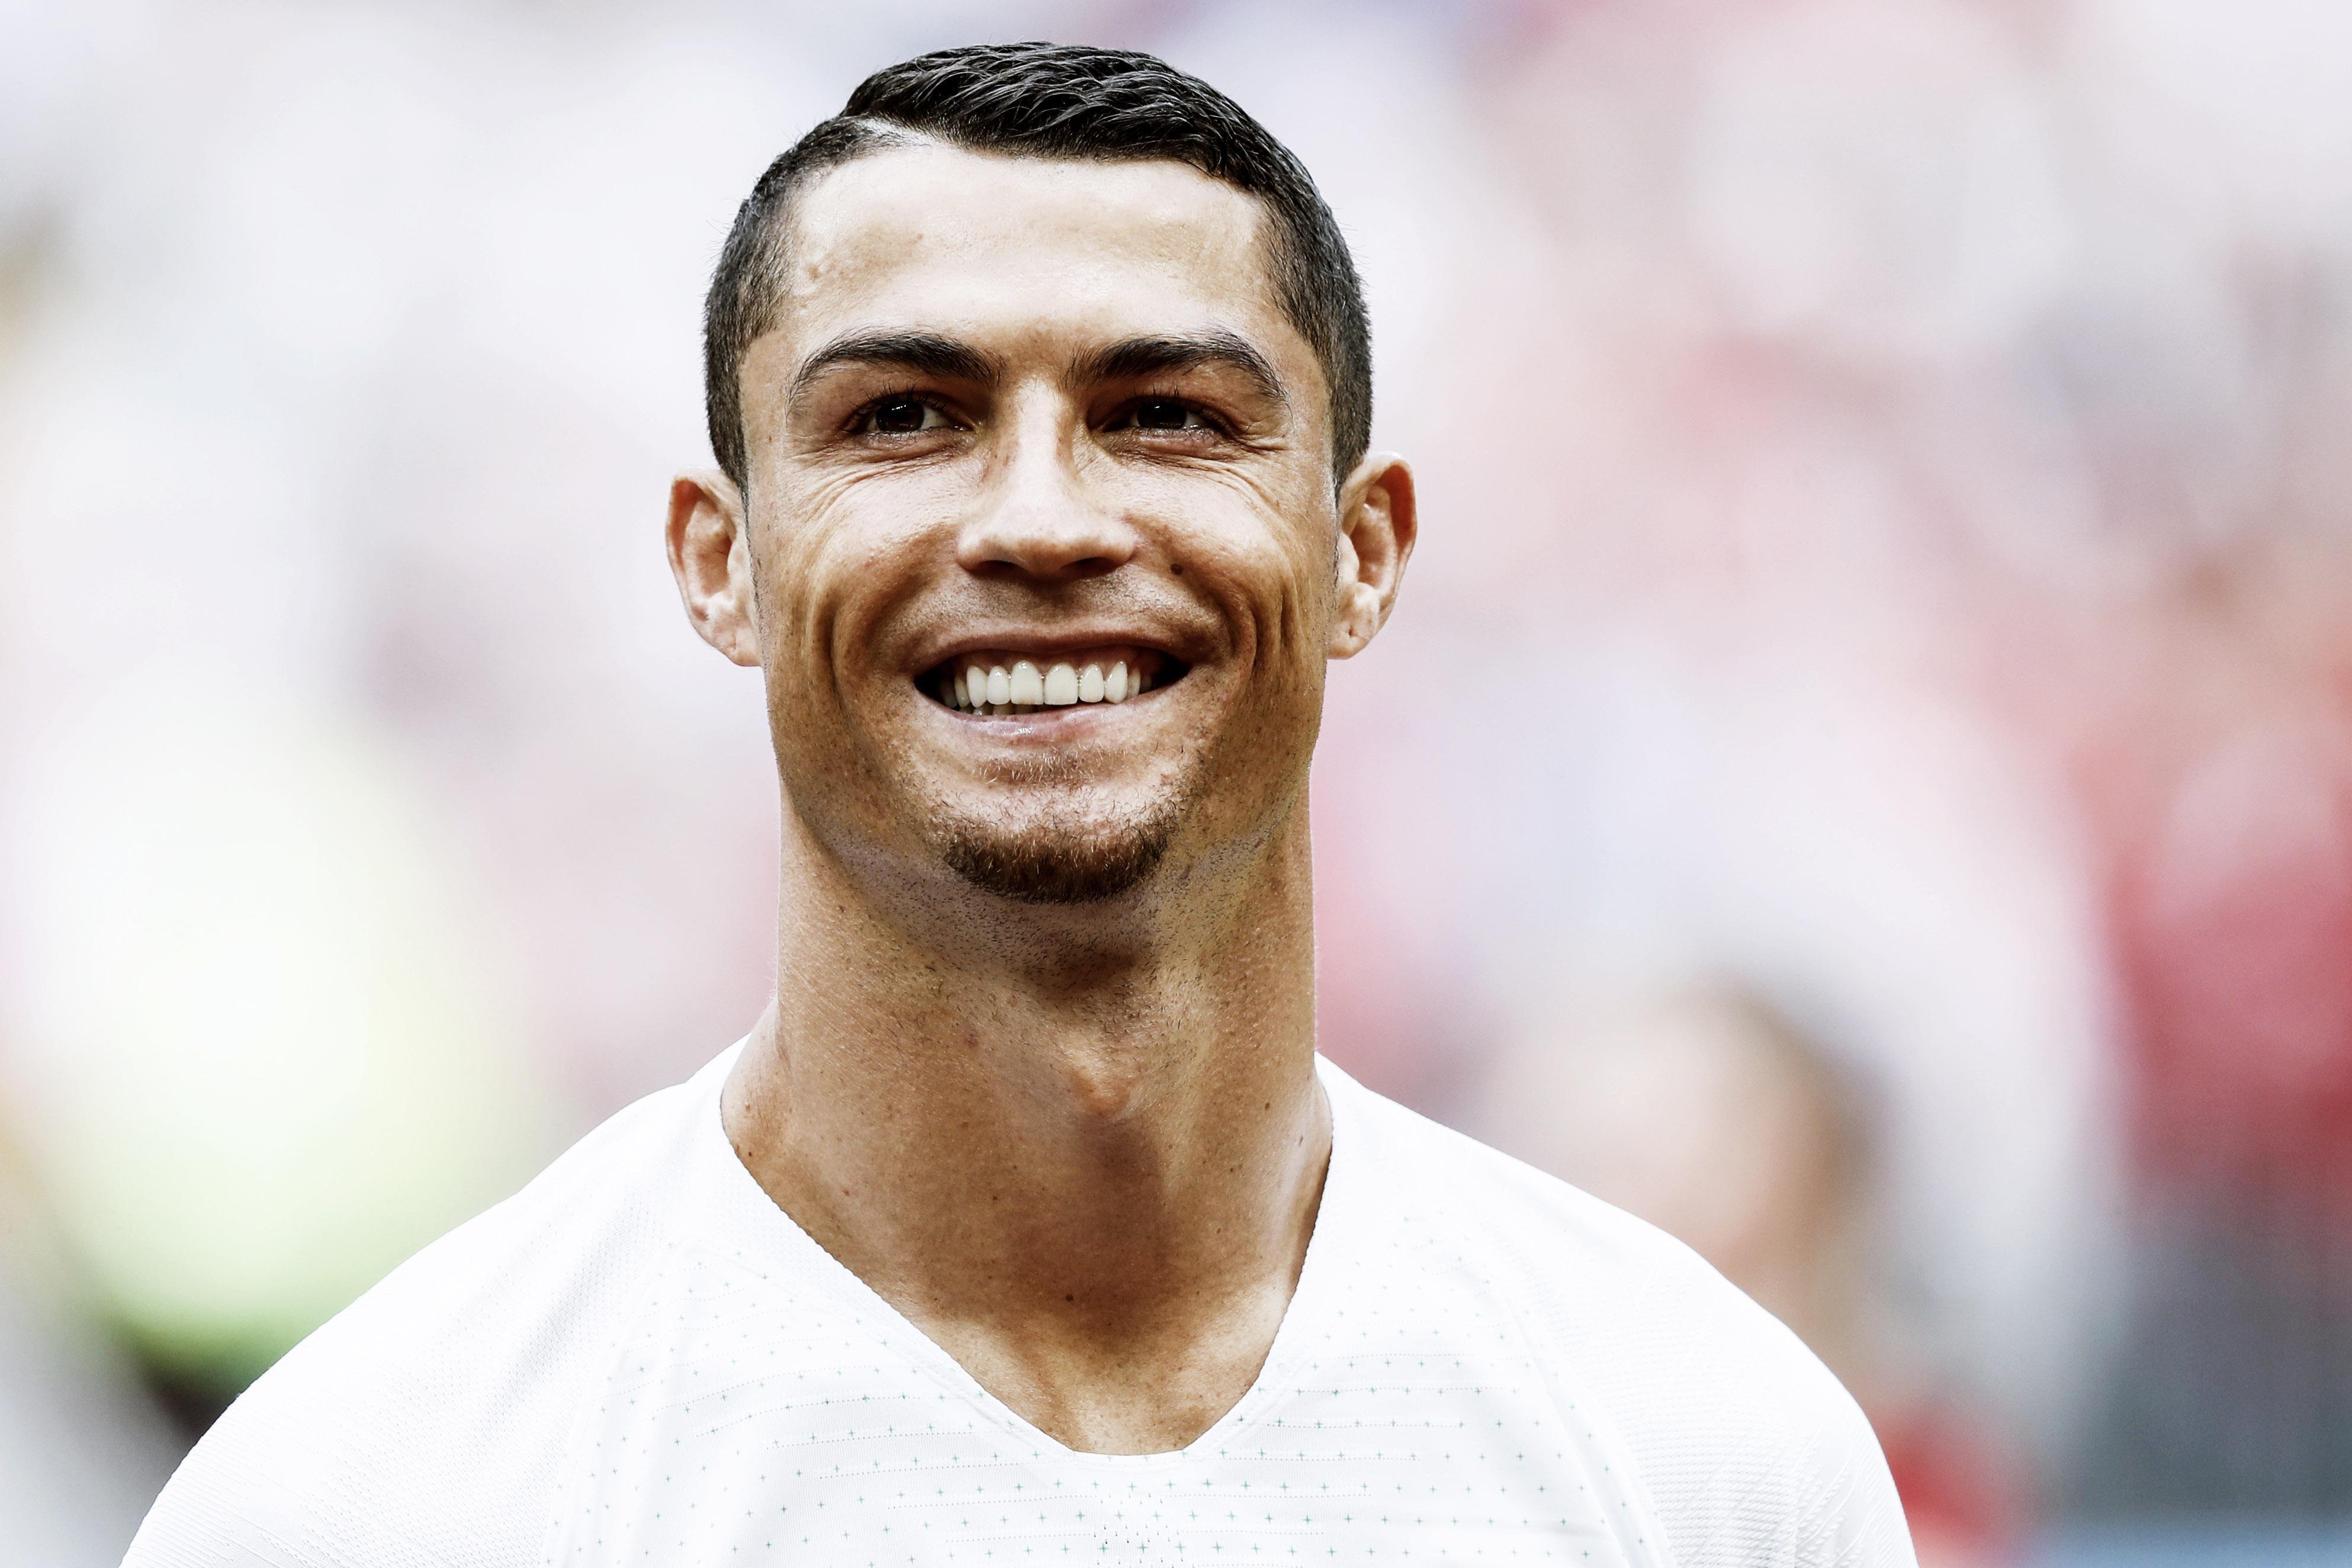 Ronaldo Ziegenbart